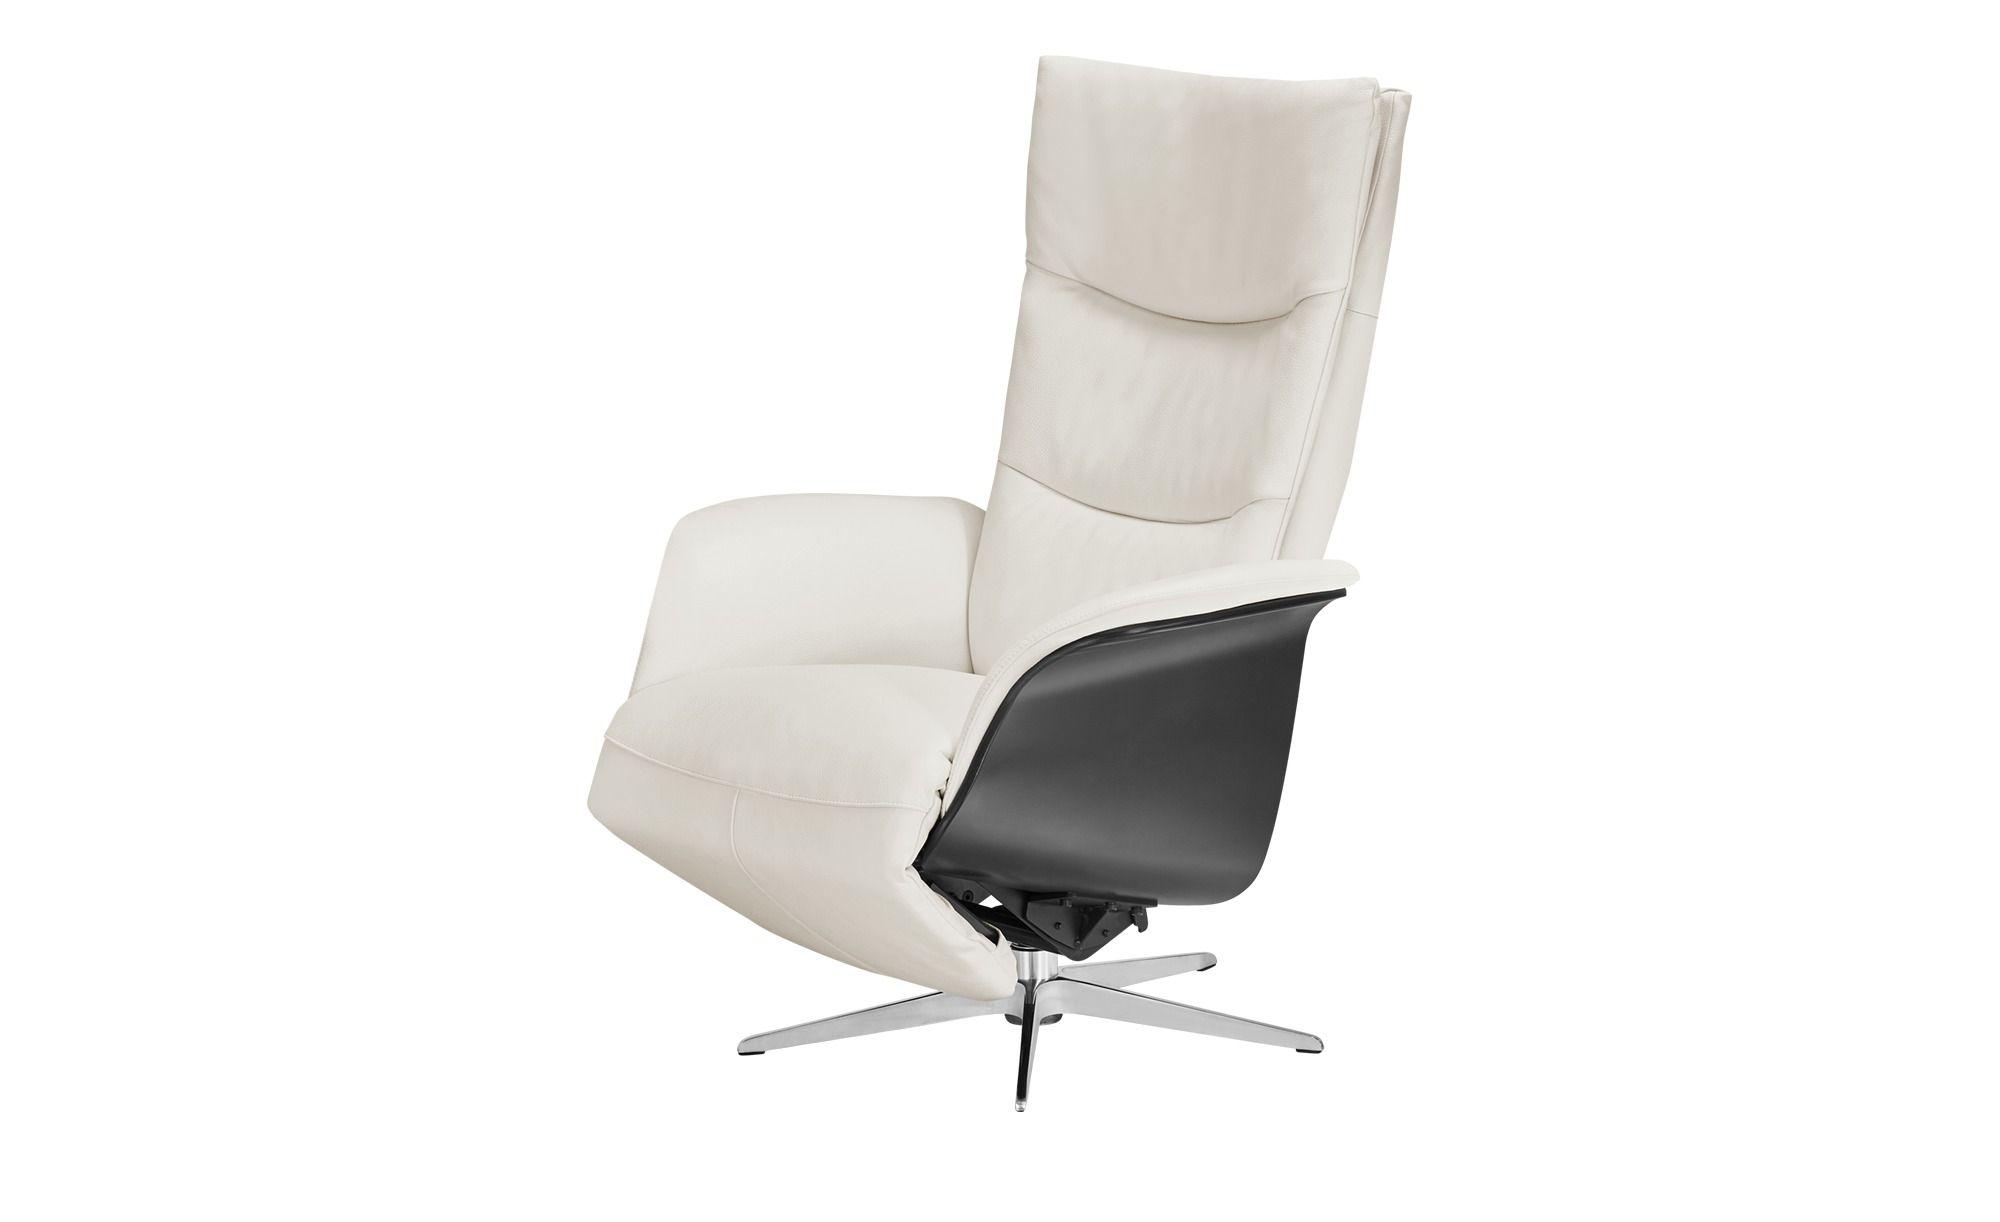 Relaxsessel Modern Ledersessel Mit Hocker Onlineshop Sessel Designer Sessel Relaxsessel Echt Leder Schwarz Relaxsessel Moderne Couch Sessel